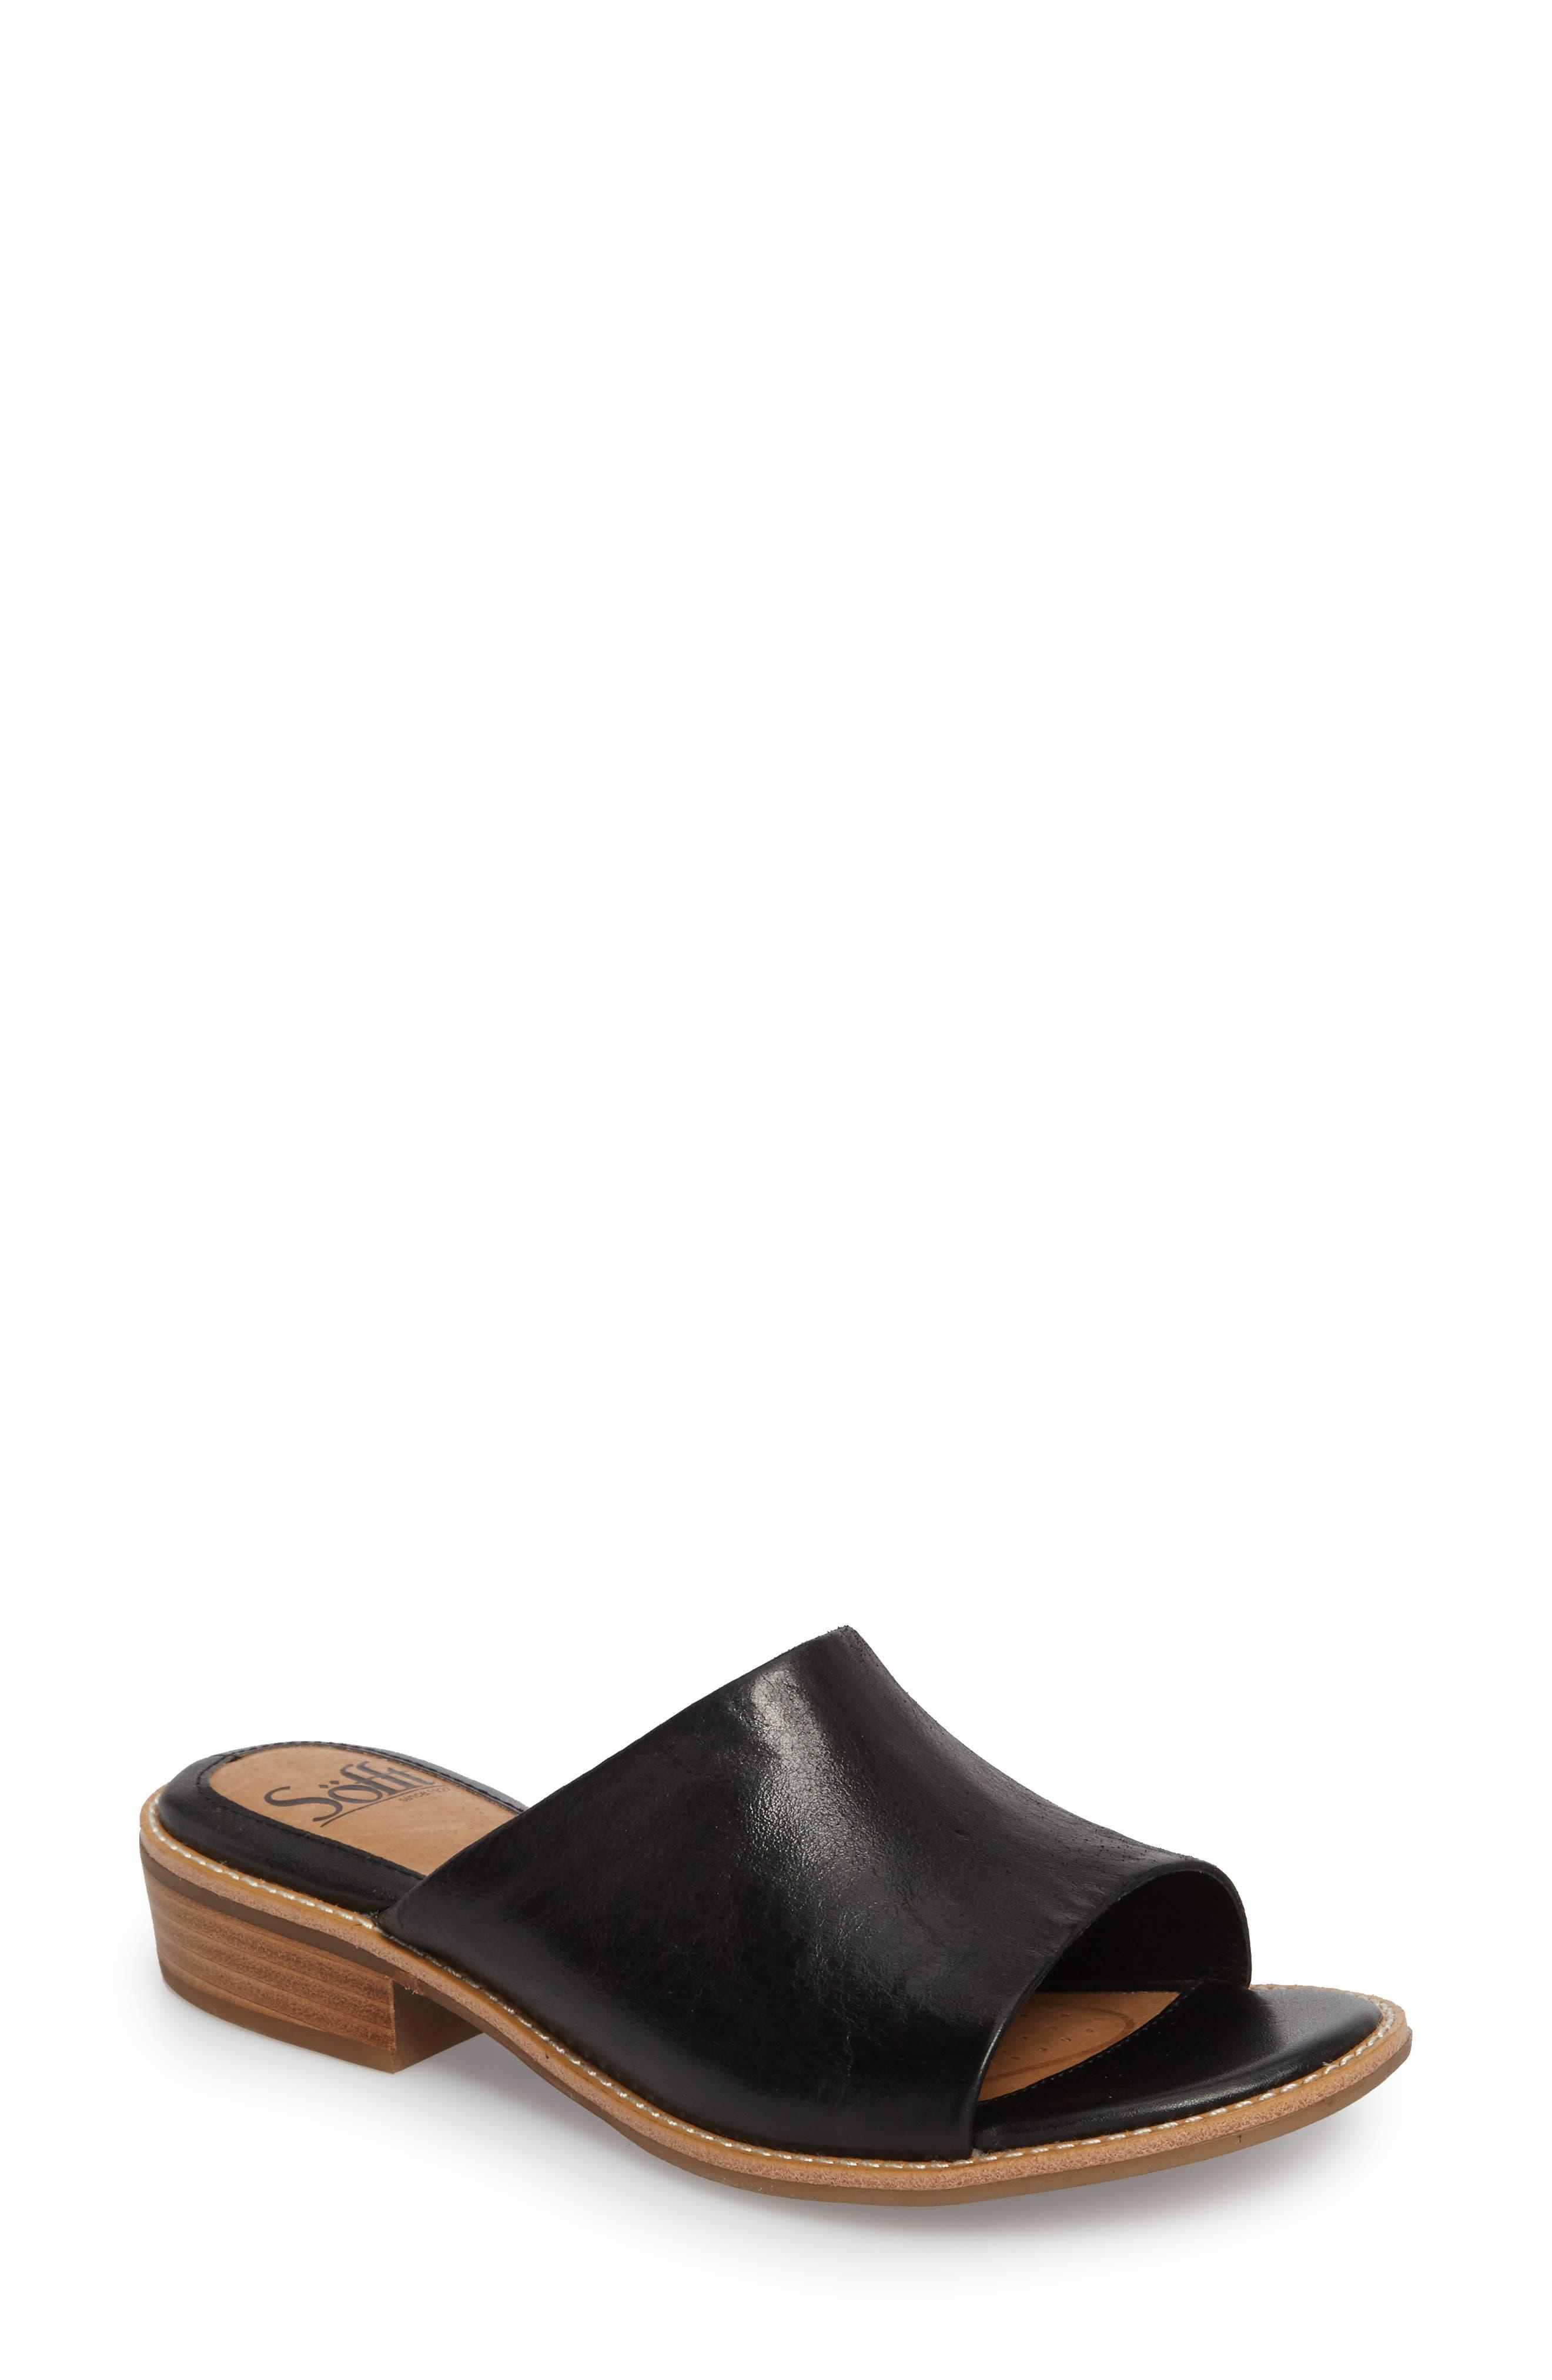 SÖFFT Nola Slide Sandal, Main, color, 001